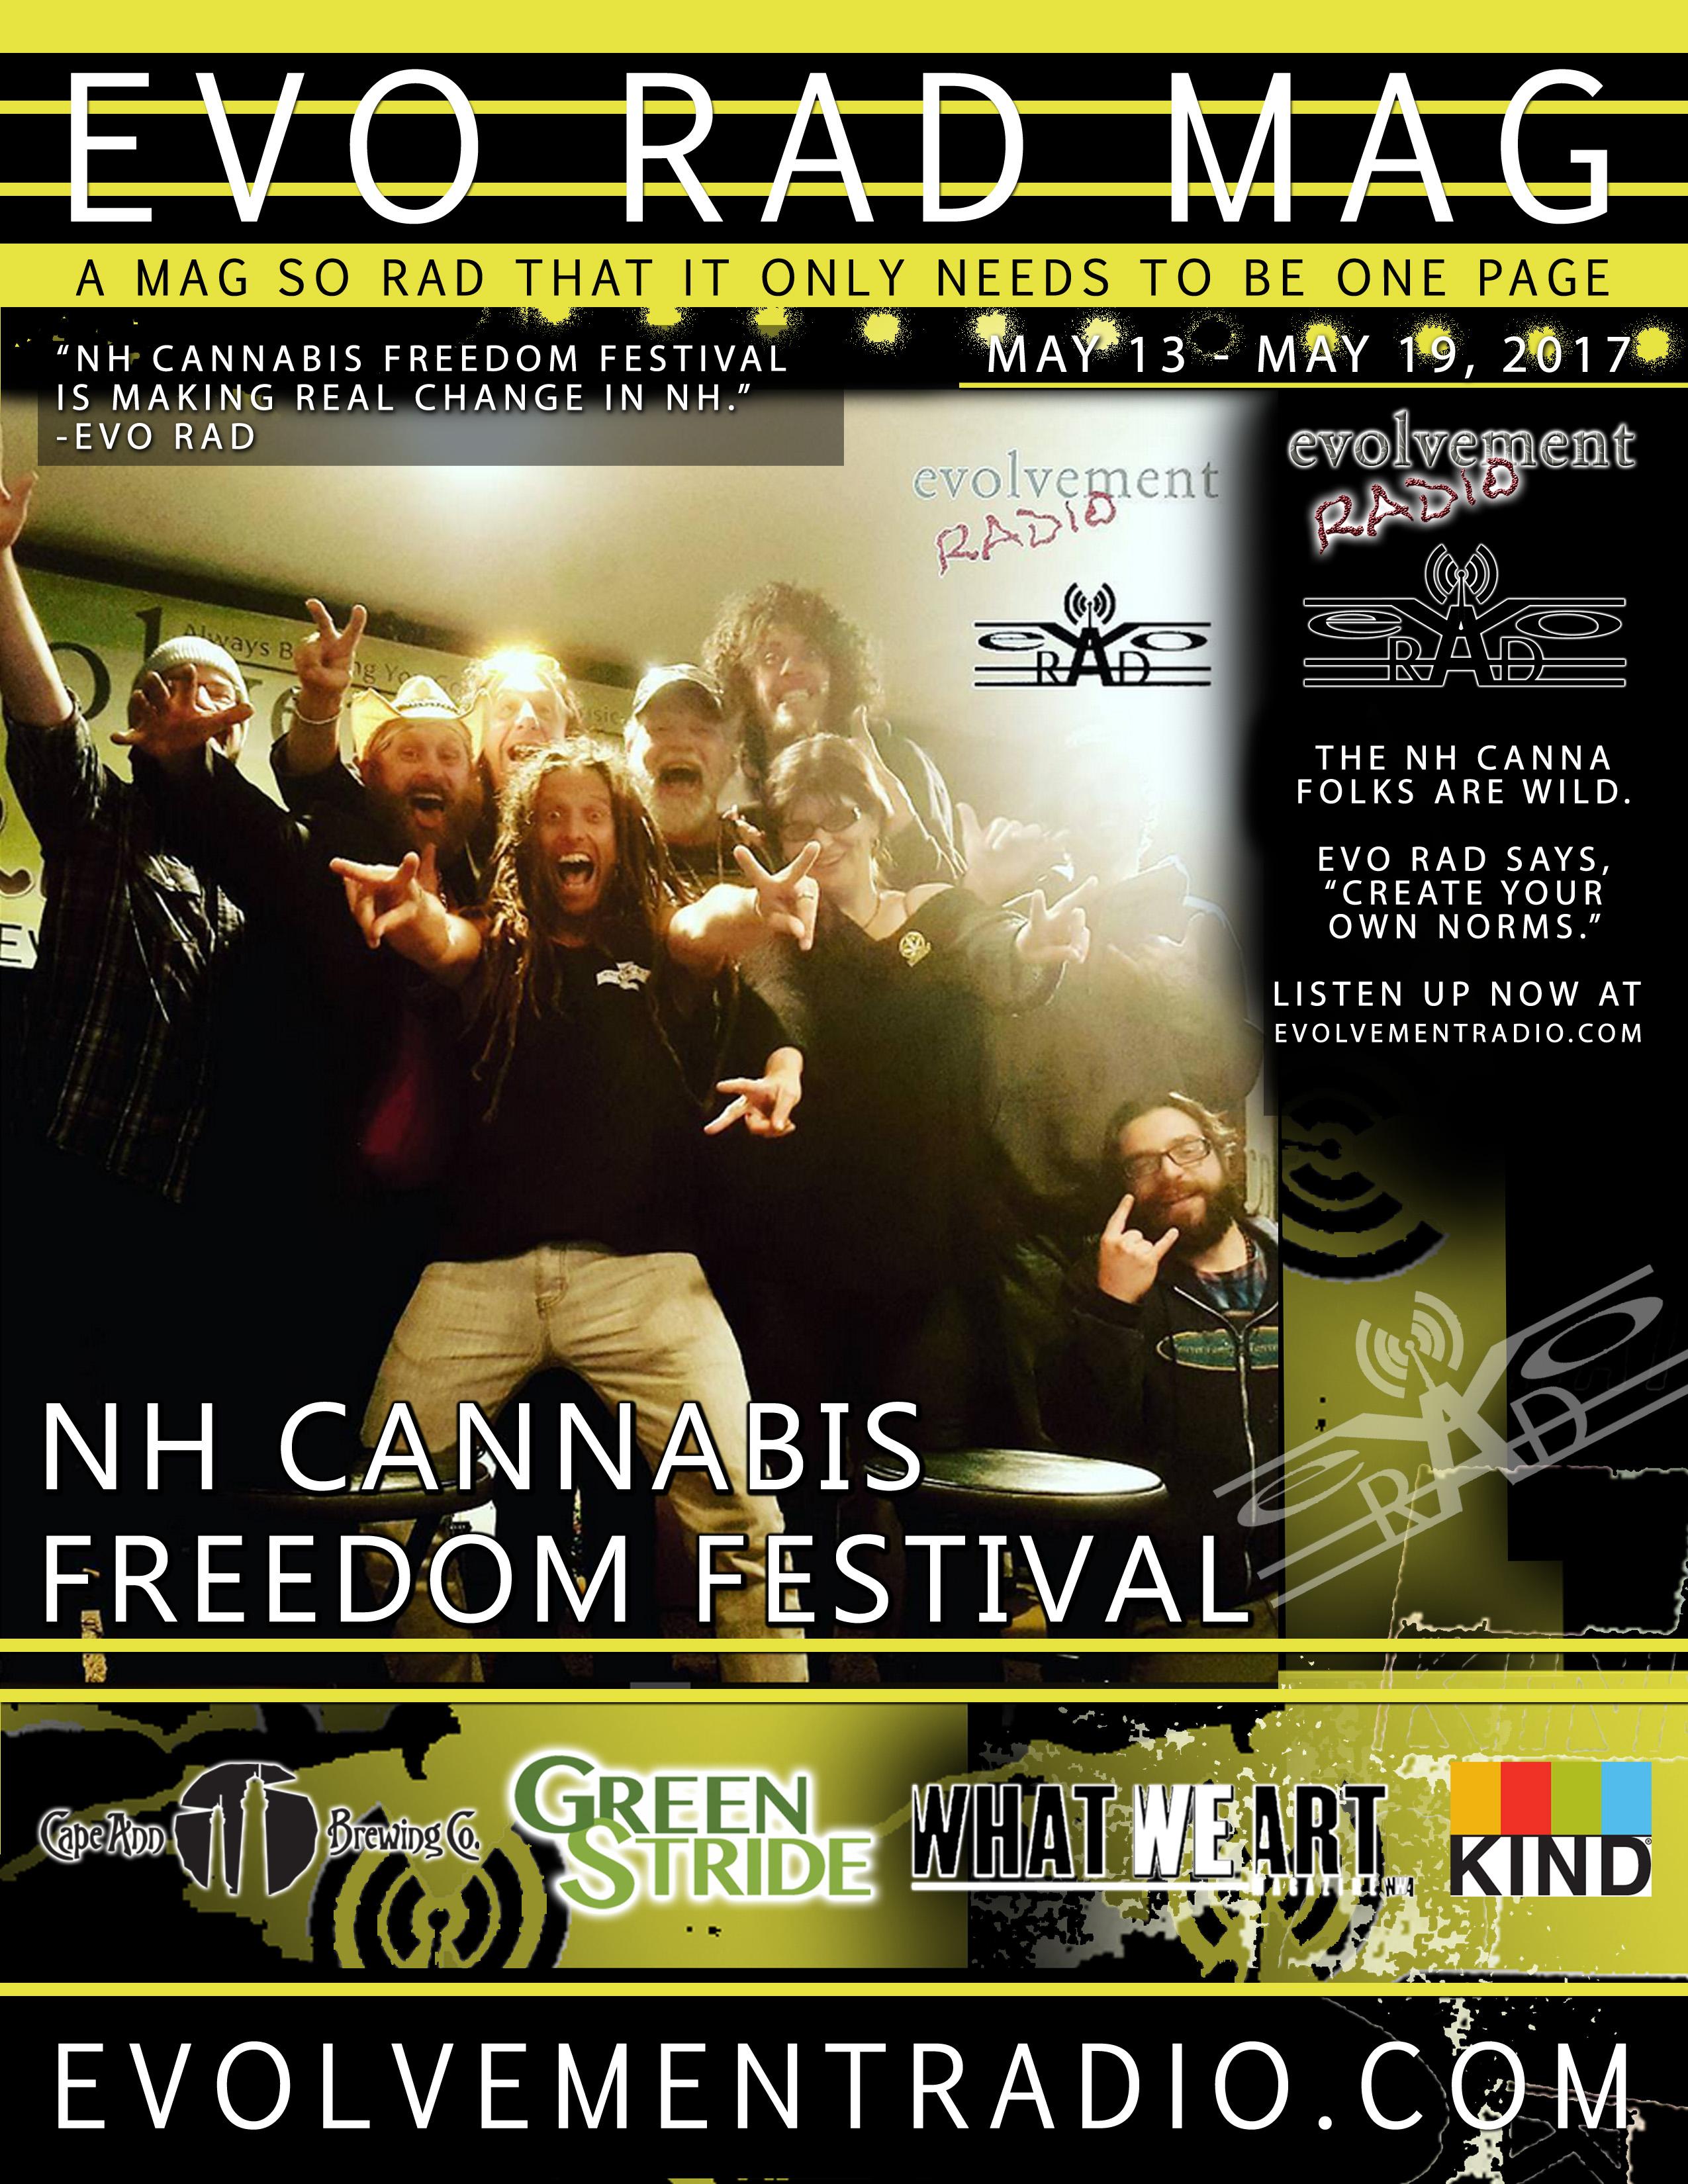 -  may 2017 - NH CANNABIS FREEDOM FESTIVAL - Evolvement Radio